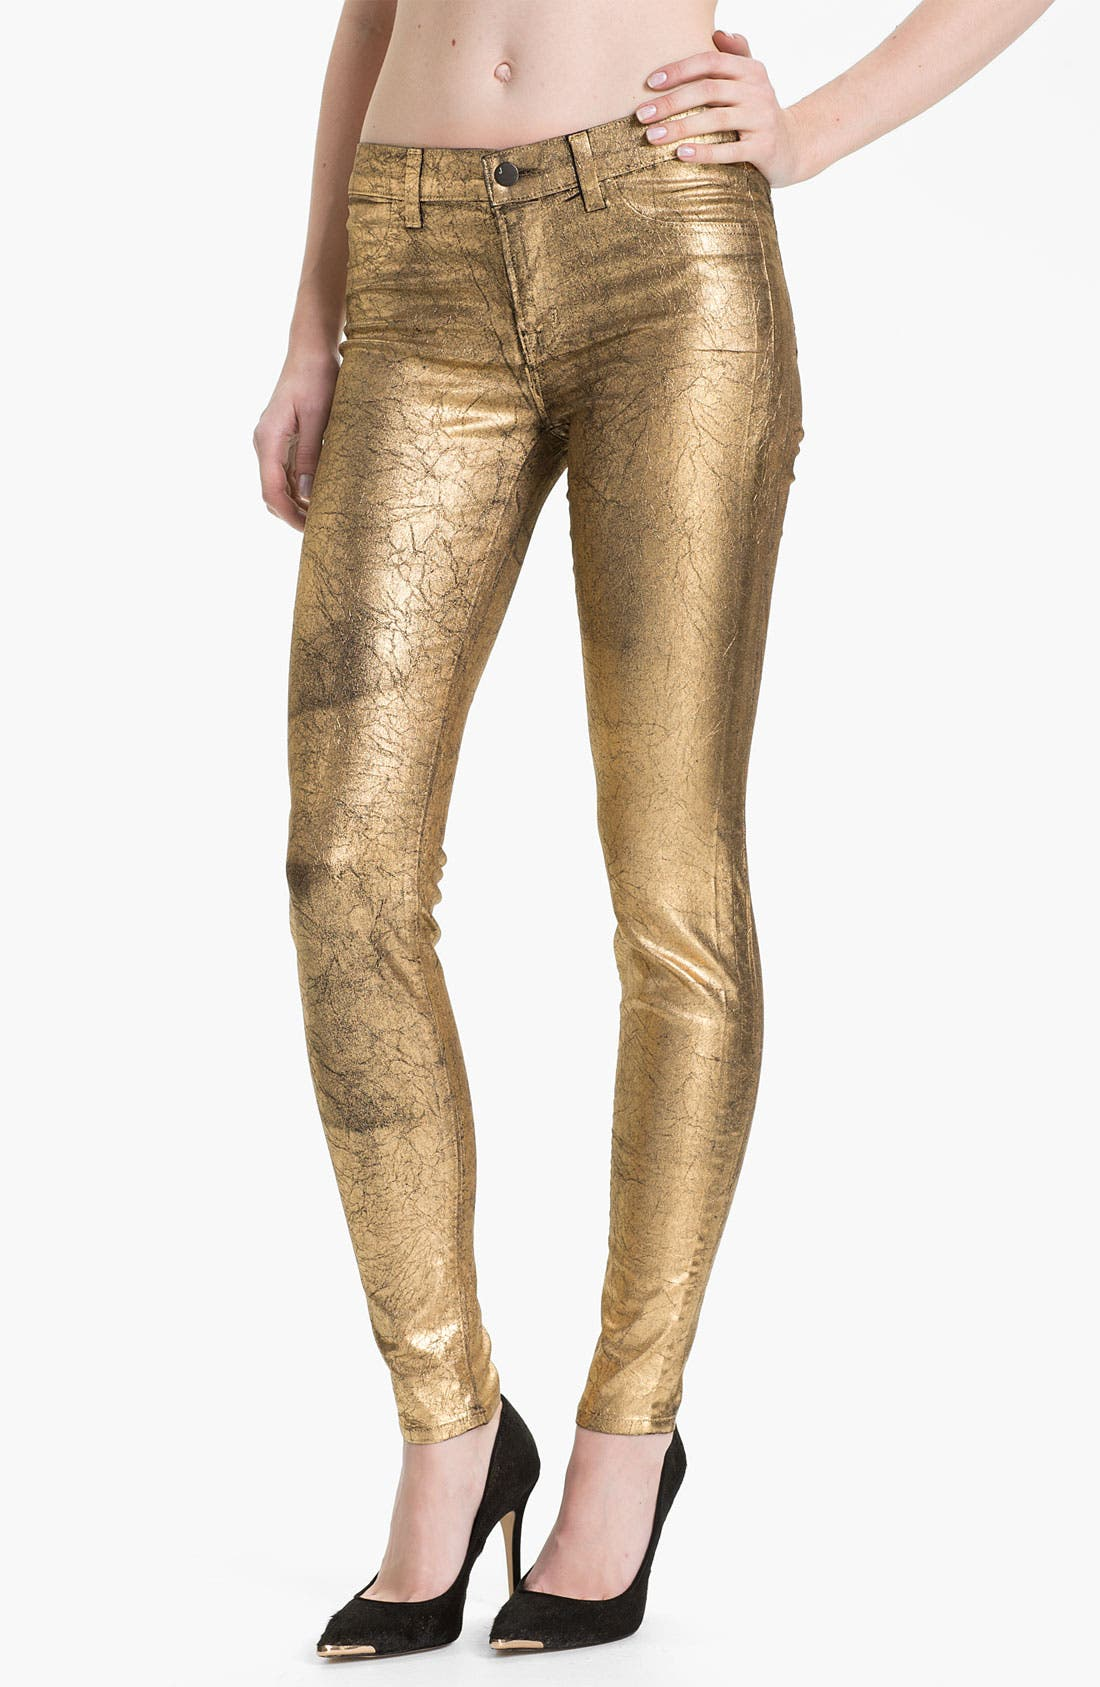 Alternate Image 1 Selected - J Brand Metallic Stretch Denim Leggings